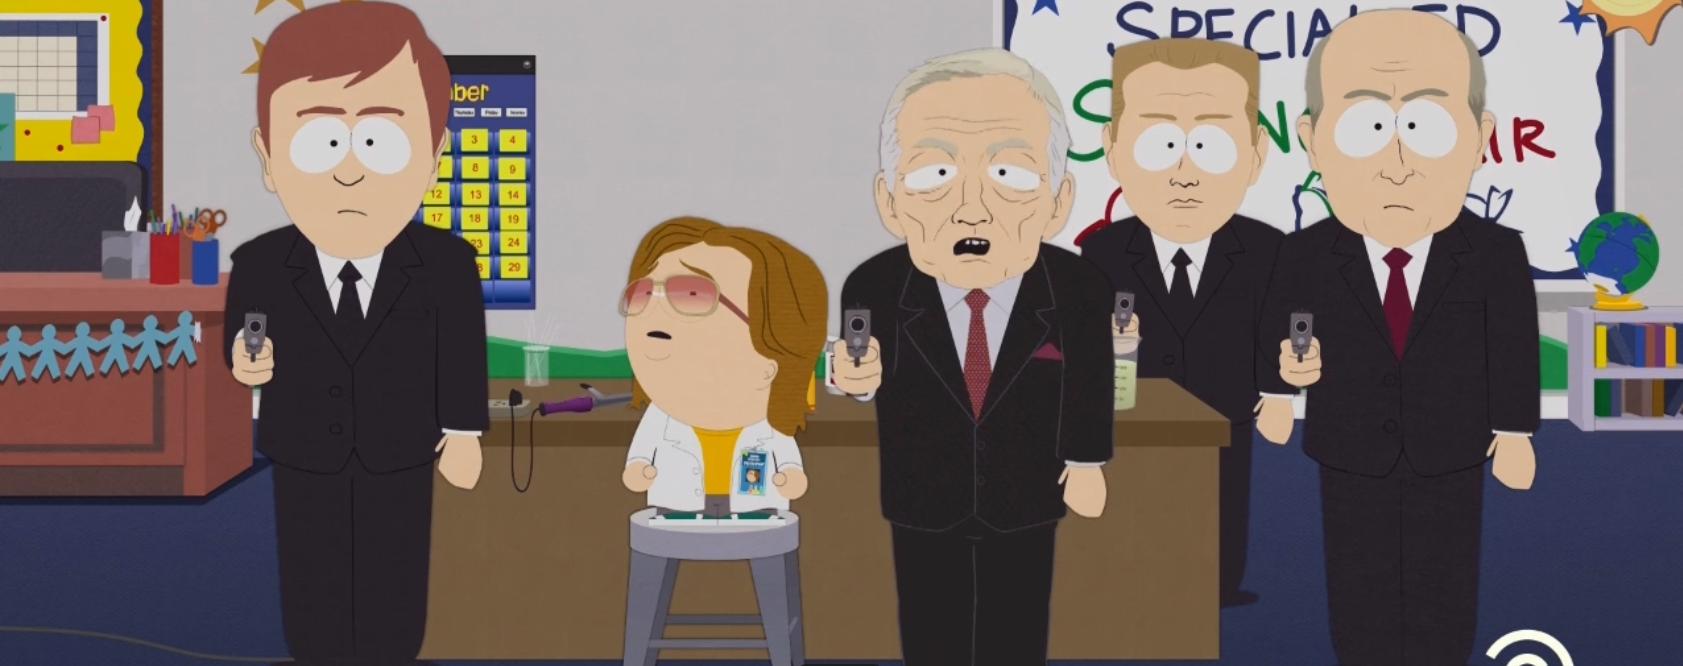 jerry jones Recapping South Park: Even Moss Piglets Love Taylor Swifts Reputation